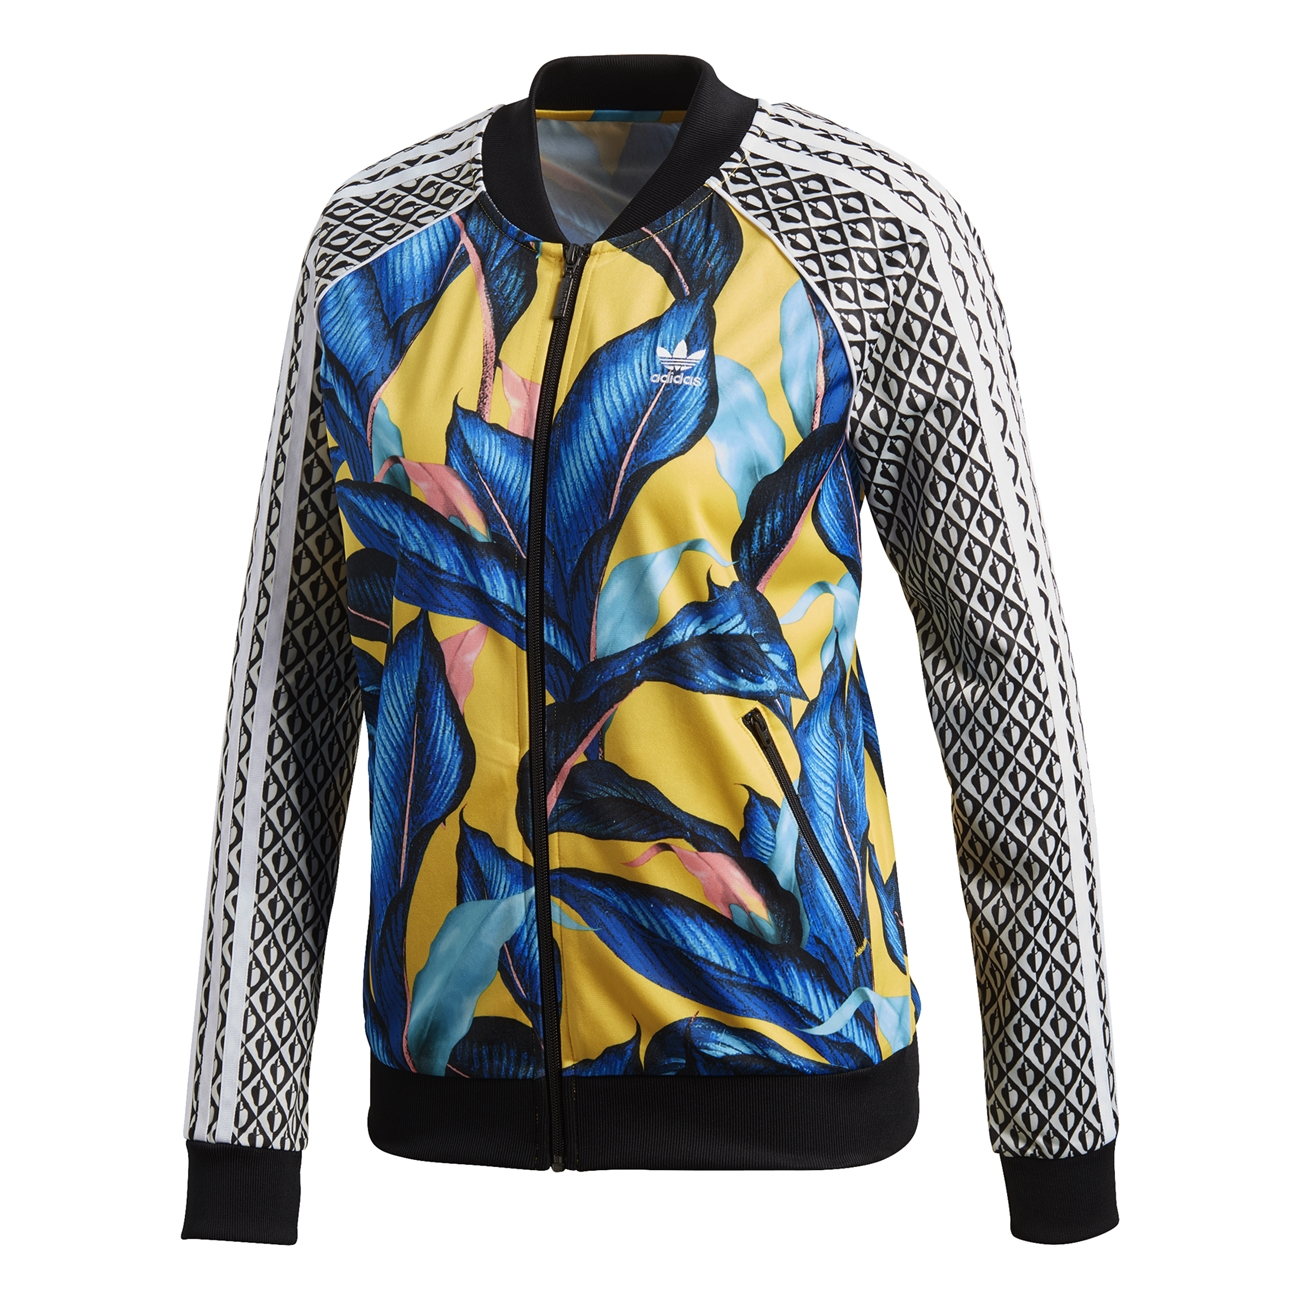 Originals Tropical multicol Jacket Adidas W Sst Track Passinho AZdgwfRqn